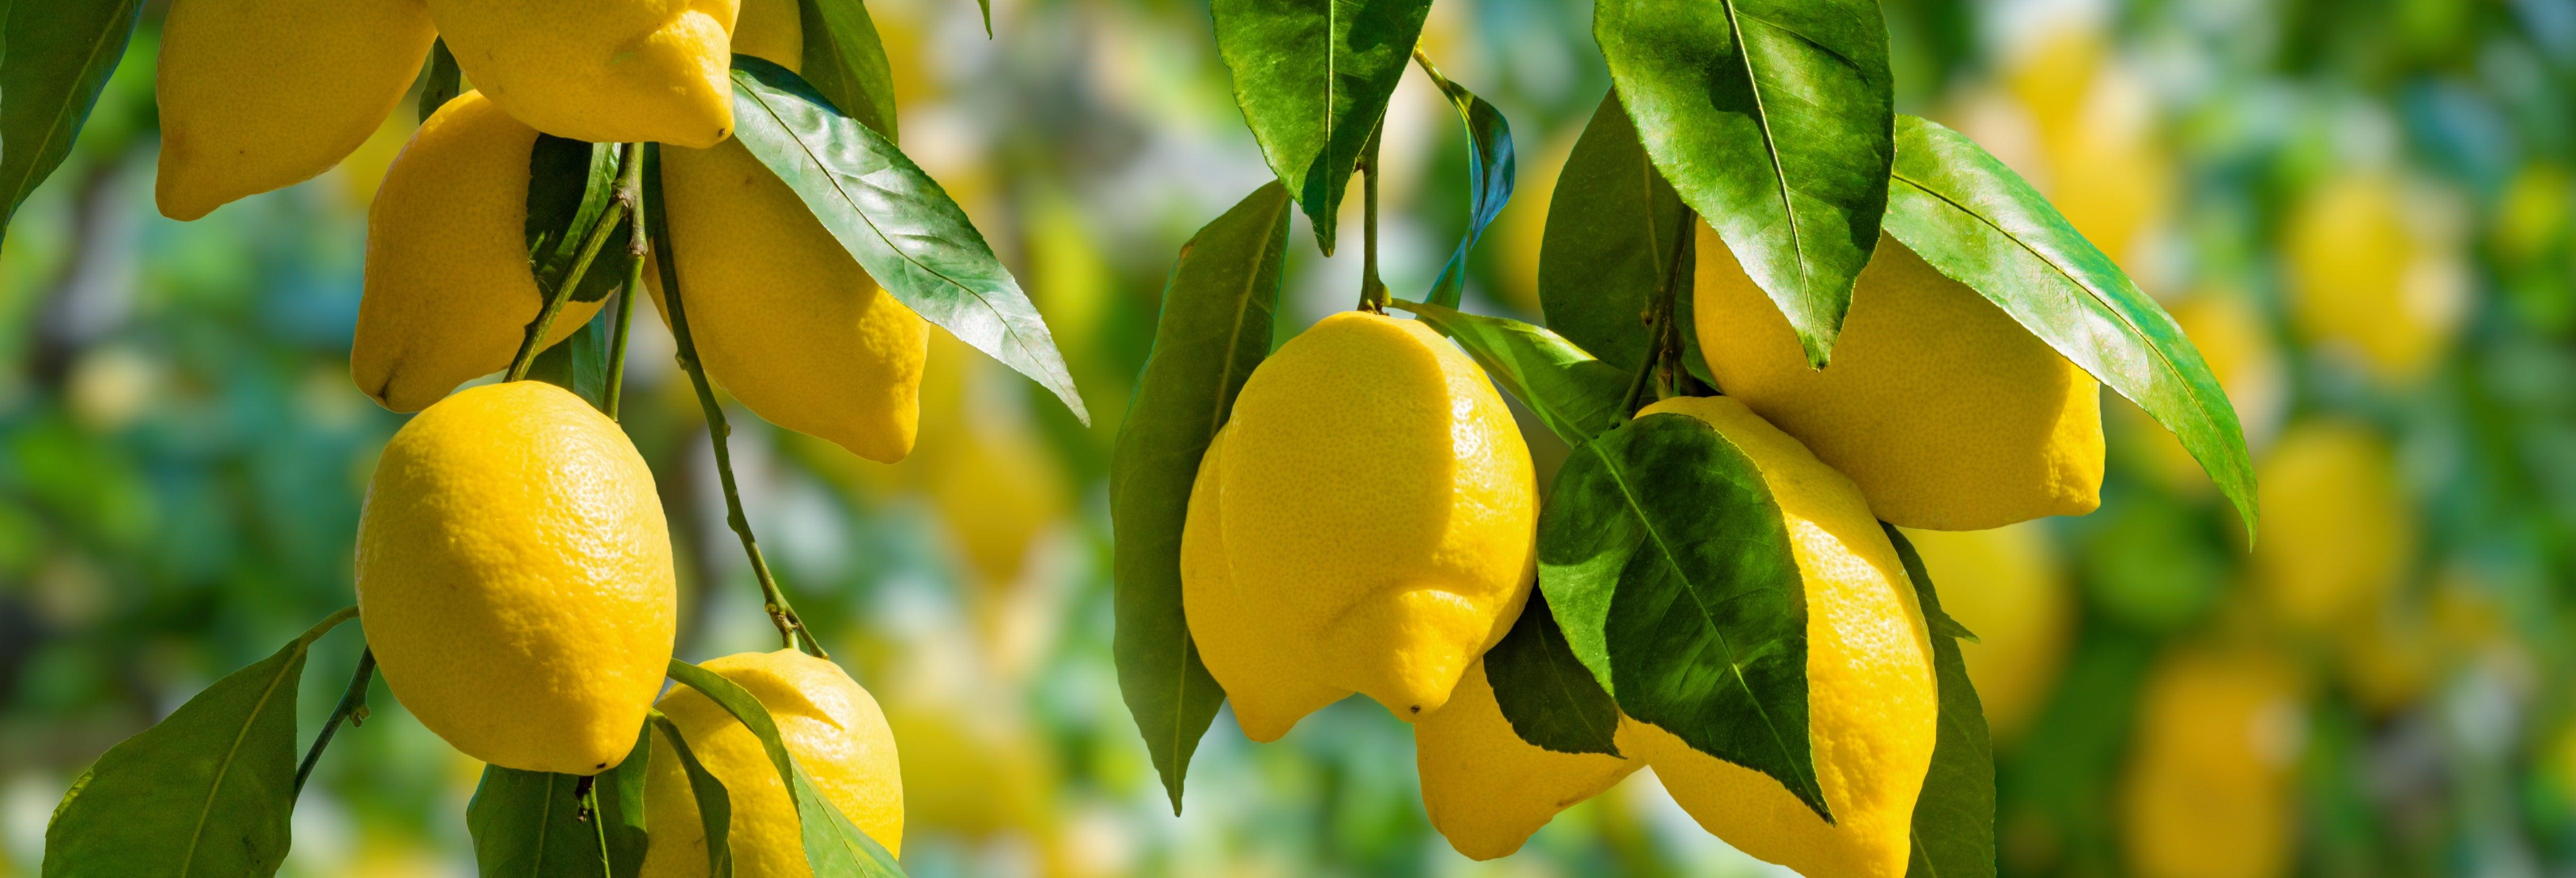 Tour del limone